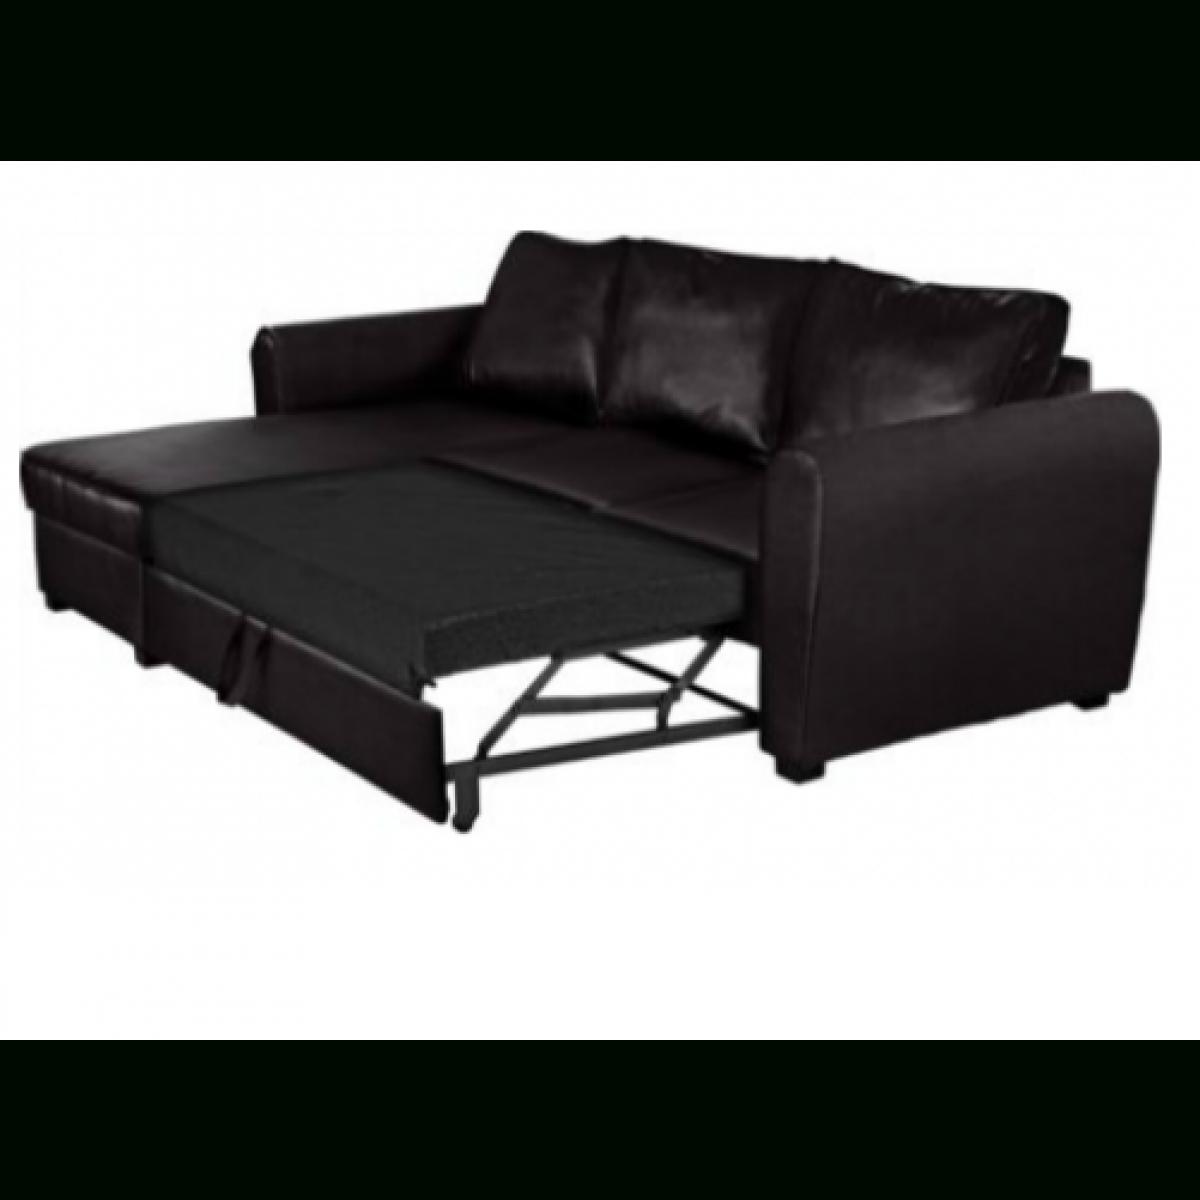 New Siena Fabric Corner Sofa Bed With Storage - Charcoal for Fabric Corner Sofa Bed (Image 22 of 30)